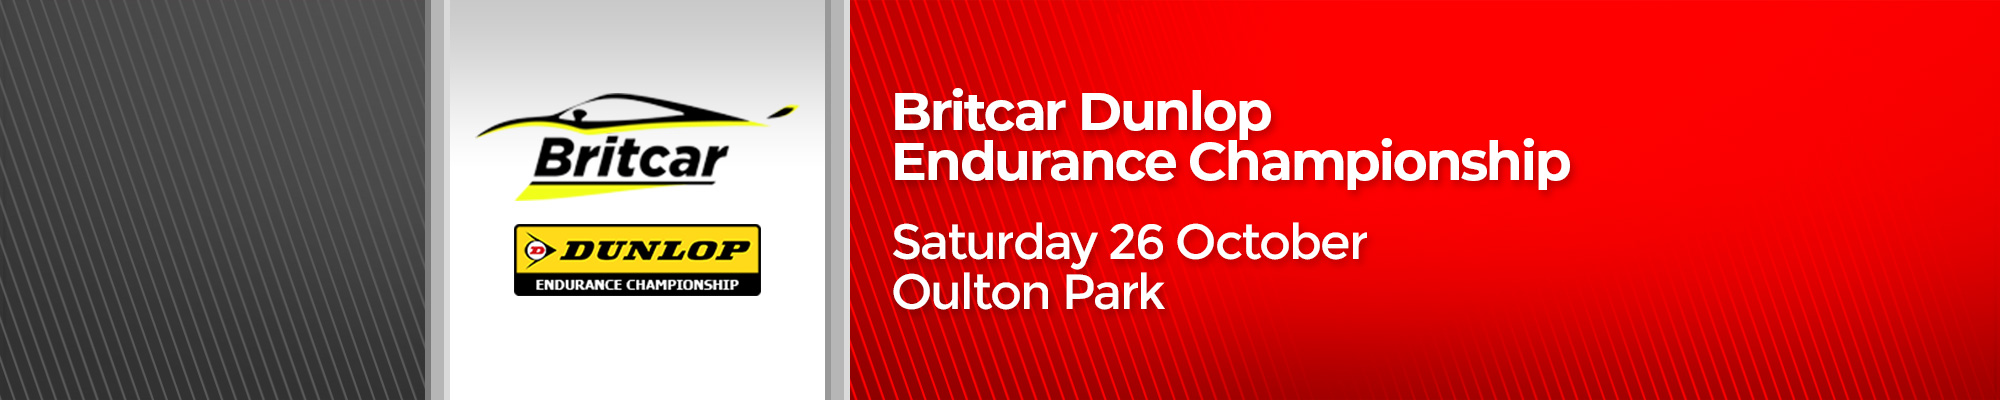 Britcar Dunlop Endurance Championship